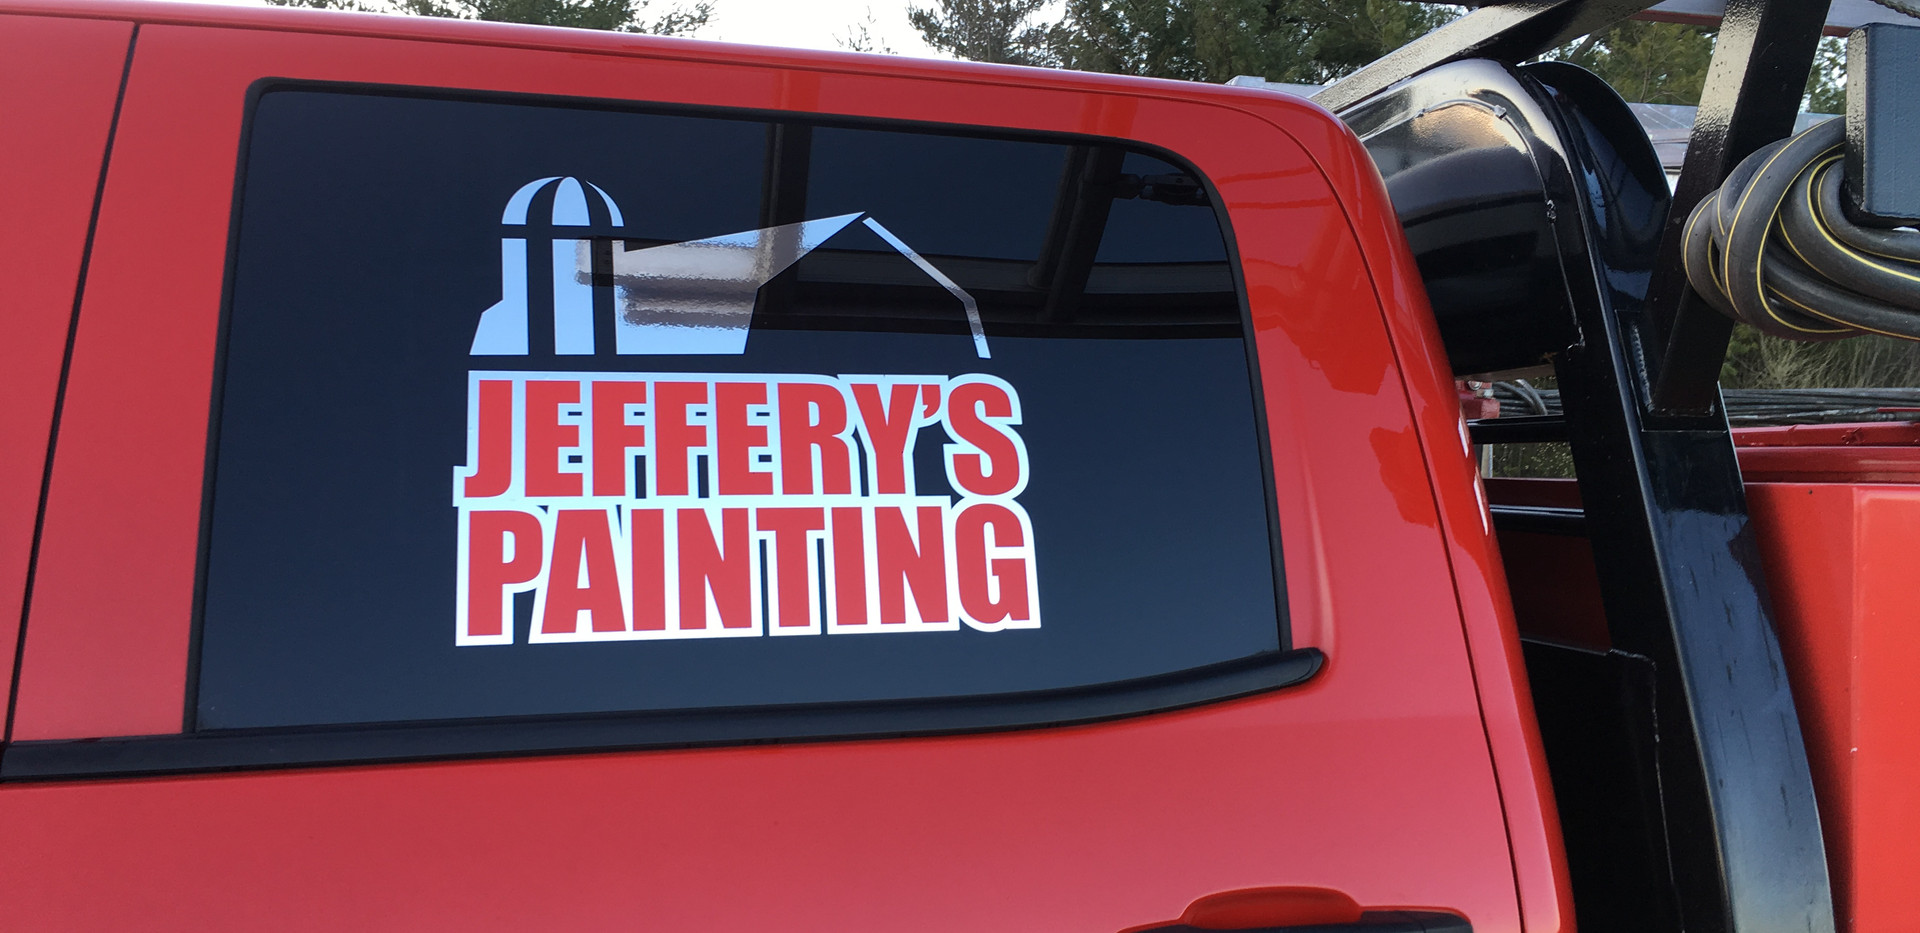 Jeffery's Painting Window Graphics